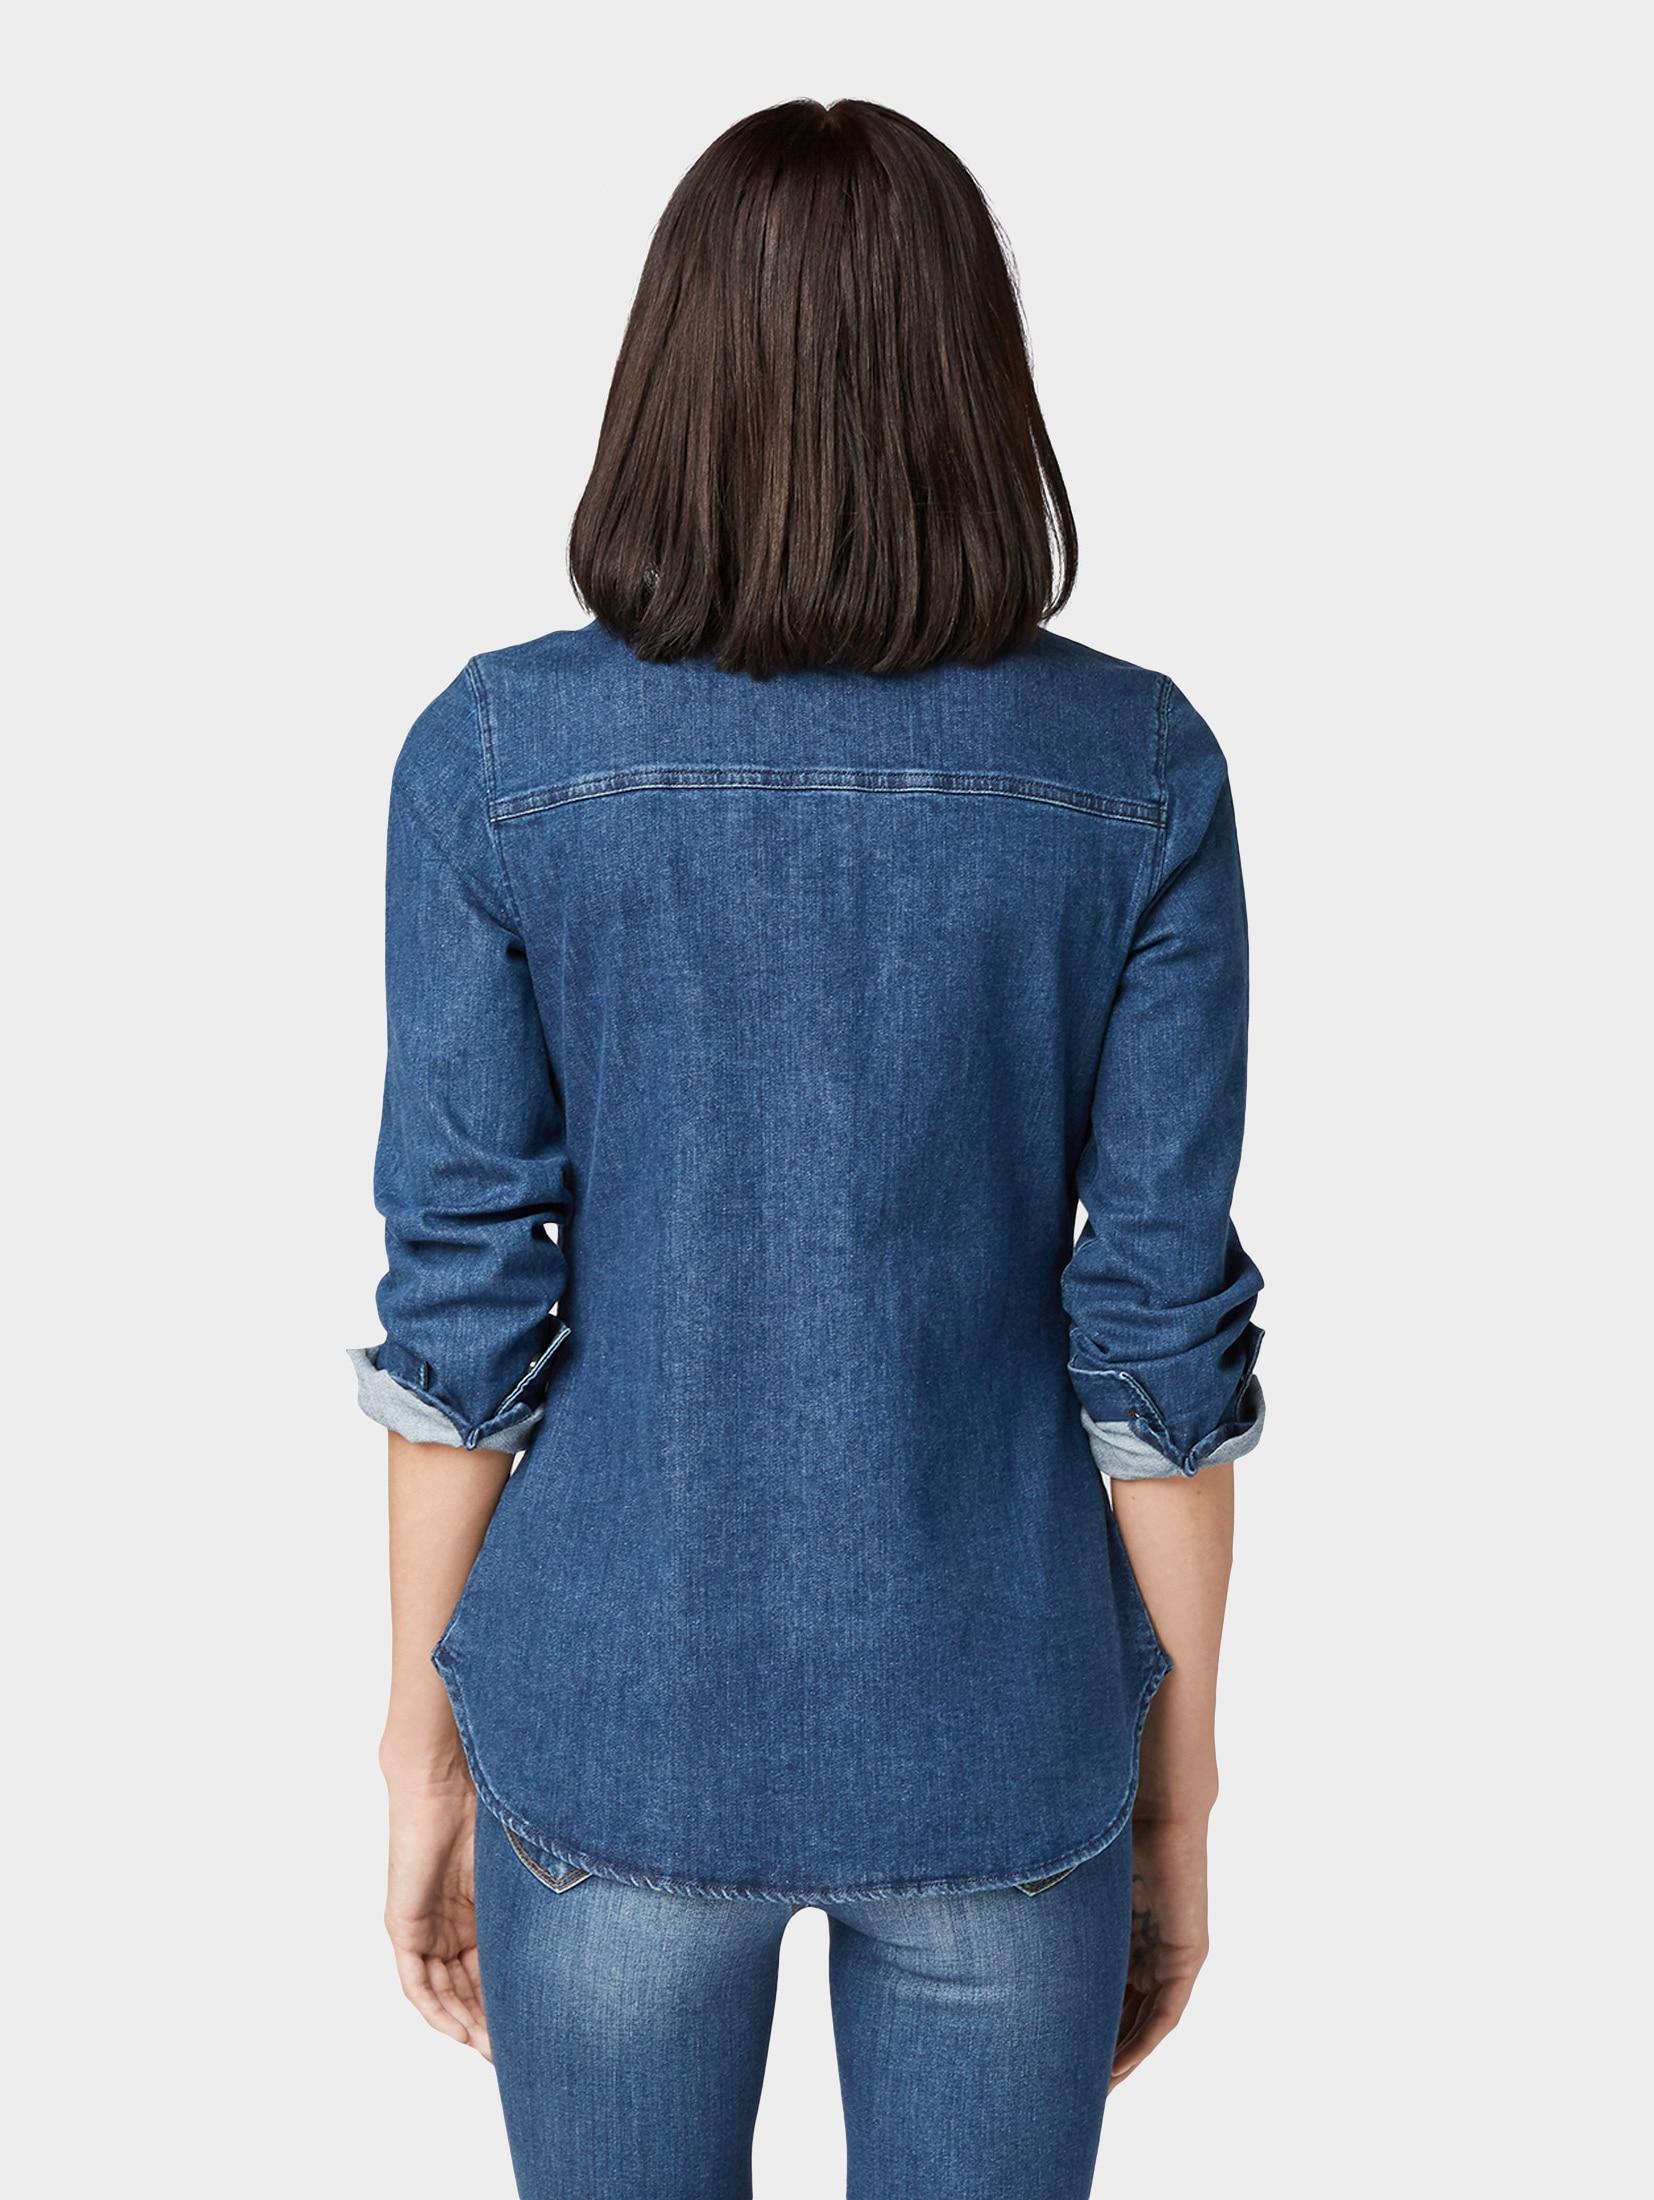 TOM TAILOR Denim Jeansbluse Tailliertes Jeanshemd